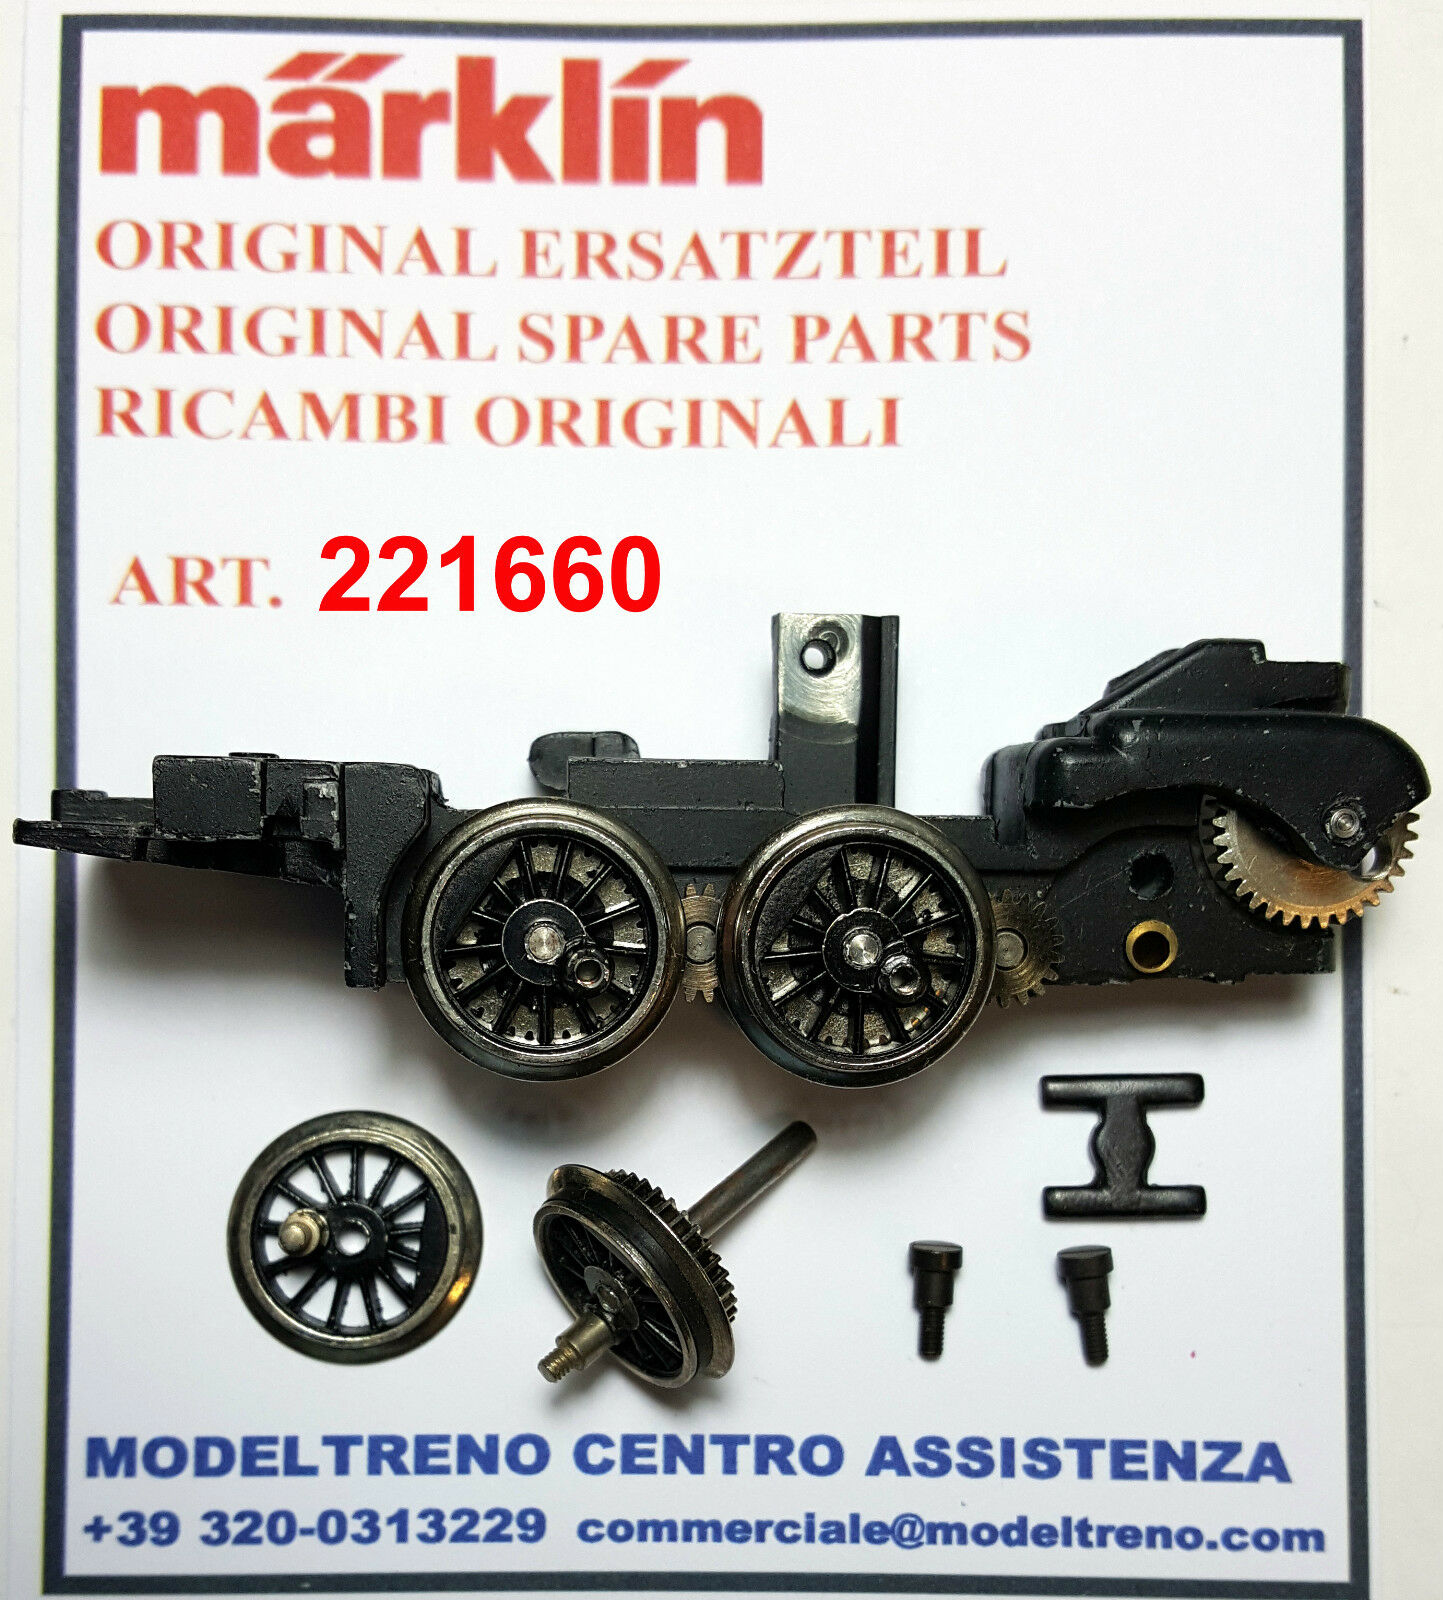 MARKLIN  22166 - 221660 TELAIO ANT.  VORDERES TREIBGESTELL  komplett  3045 3046